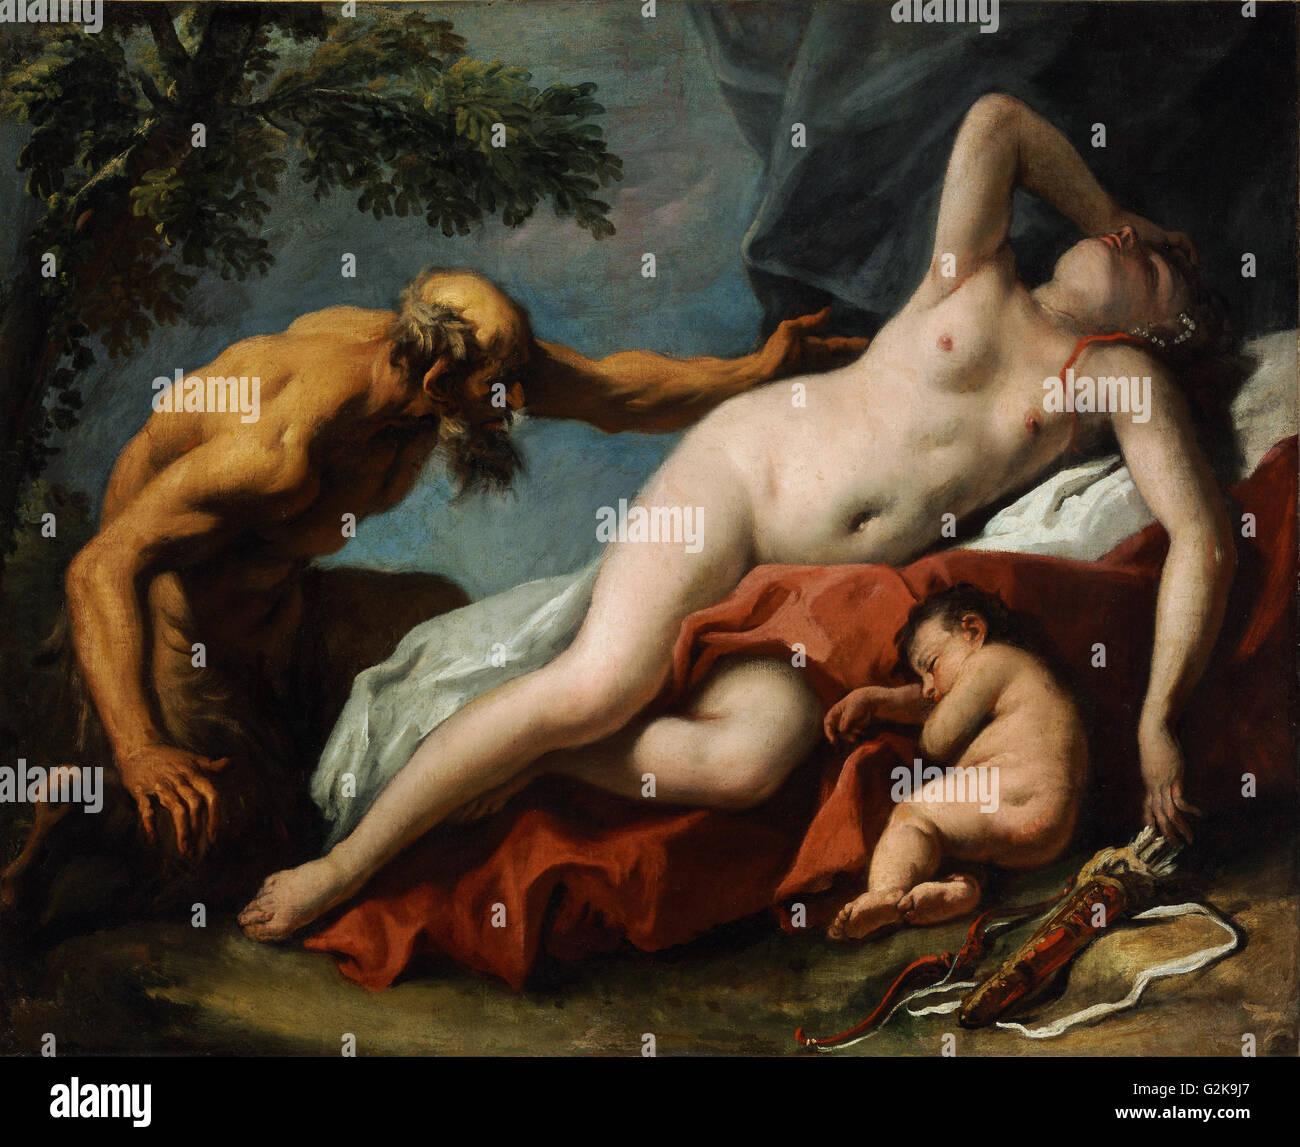 Sebastiano Ricci - Venus and Satyr  - Museum of Fine Arts, Budapest Stock Photo